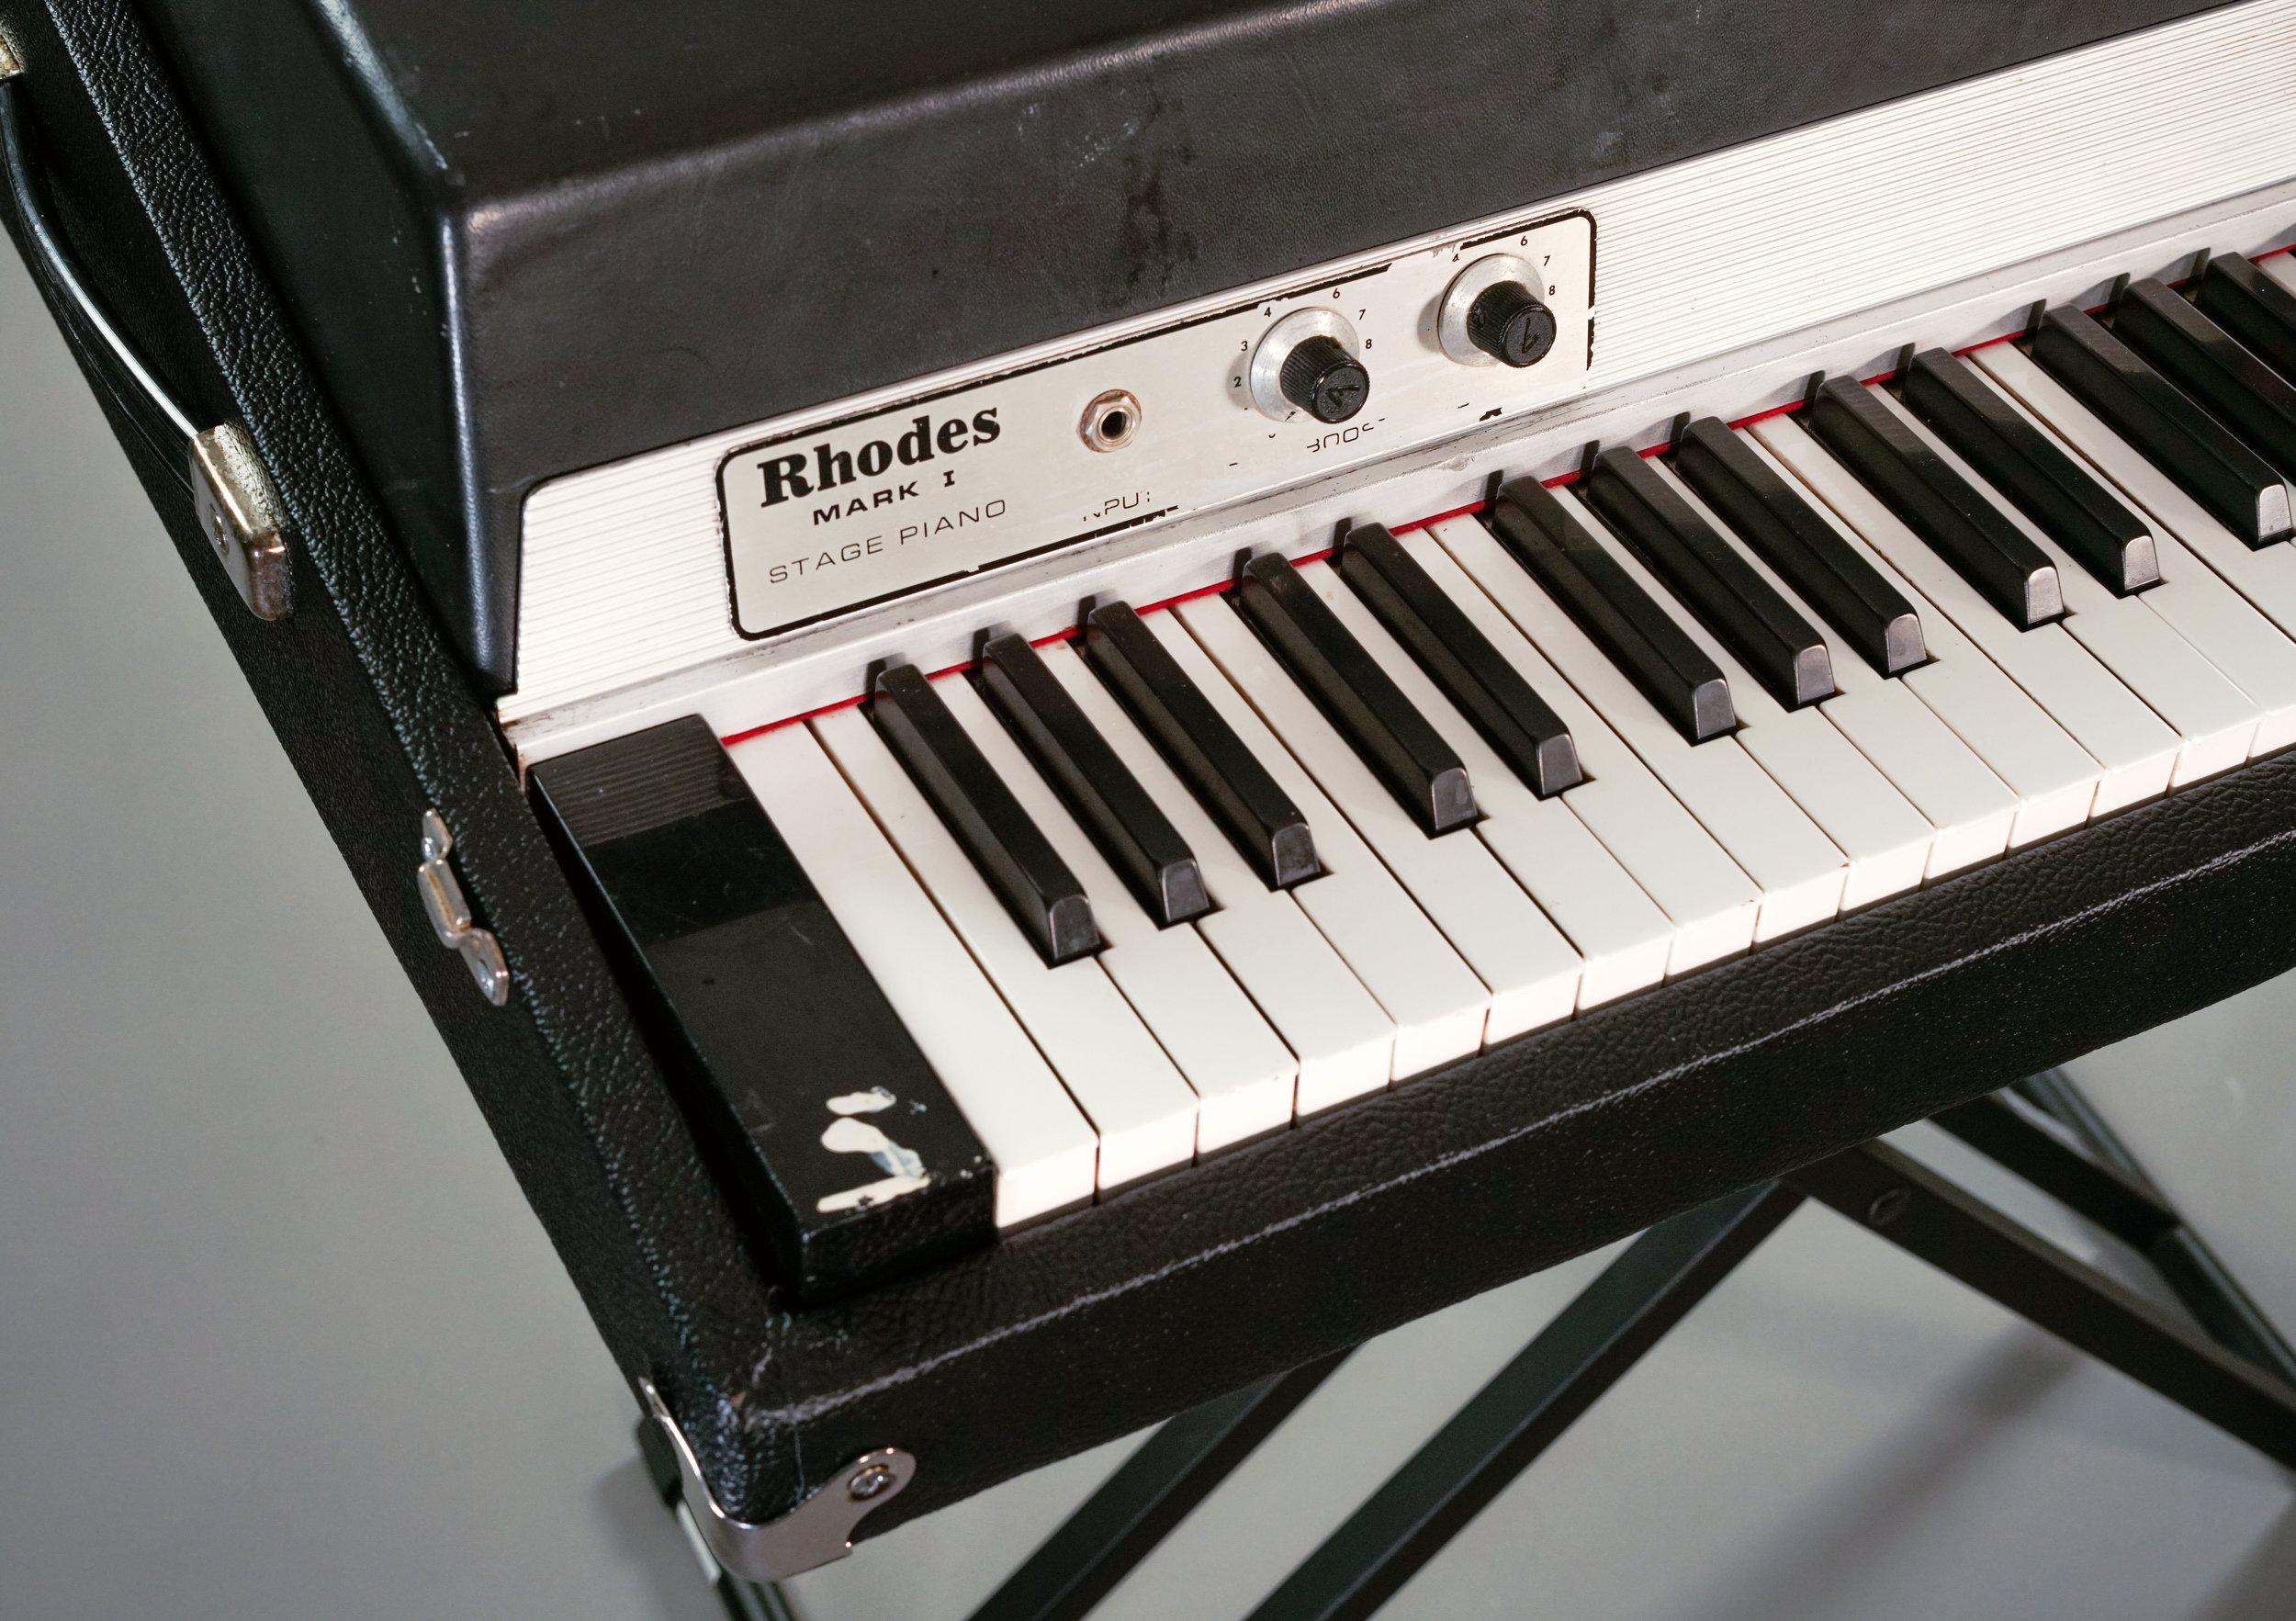 rhodes piano dating srpski dating toronto